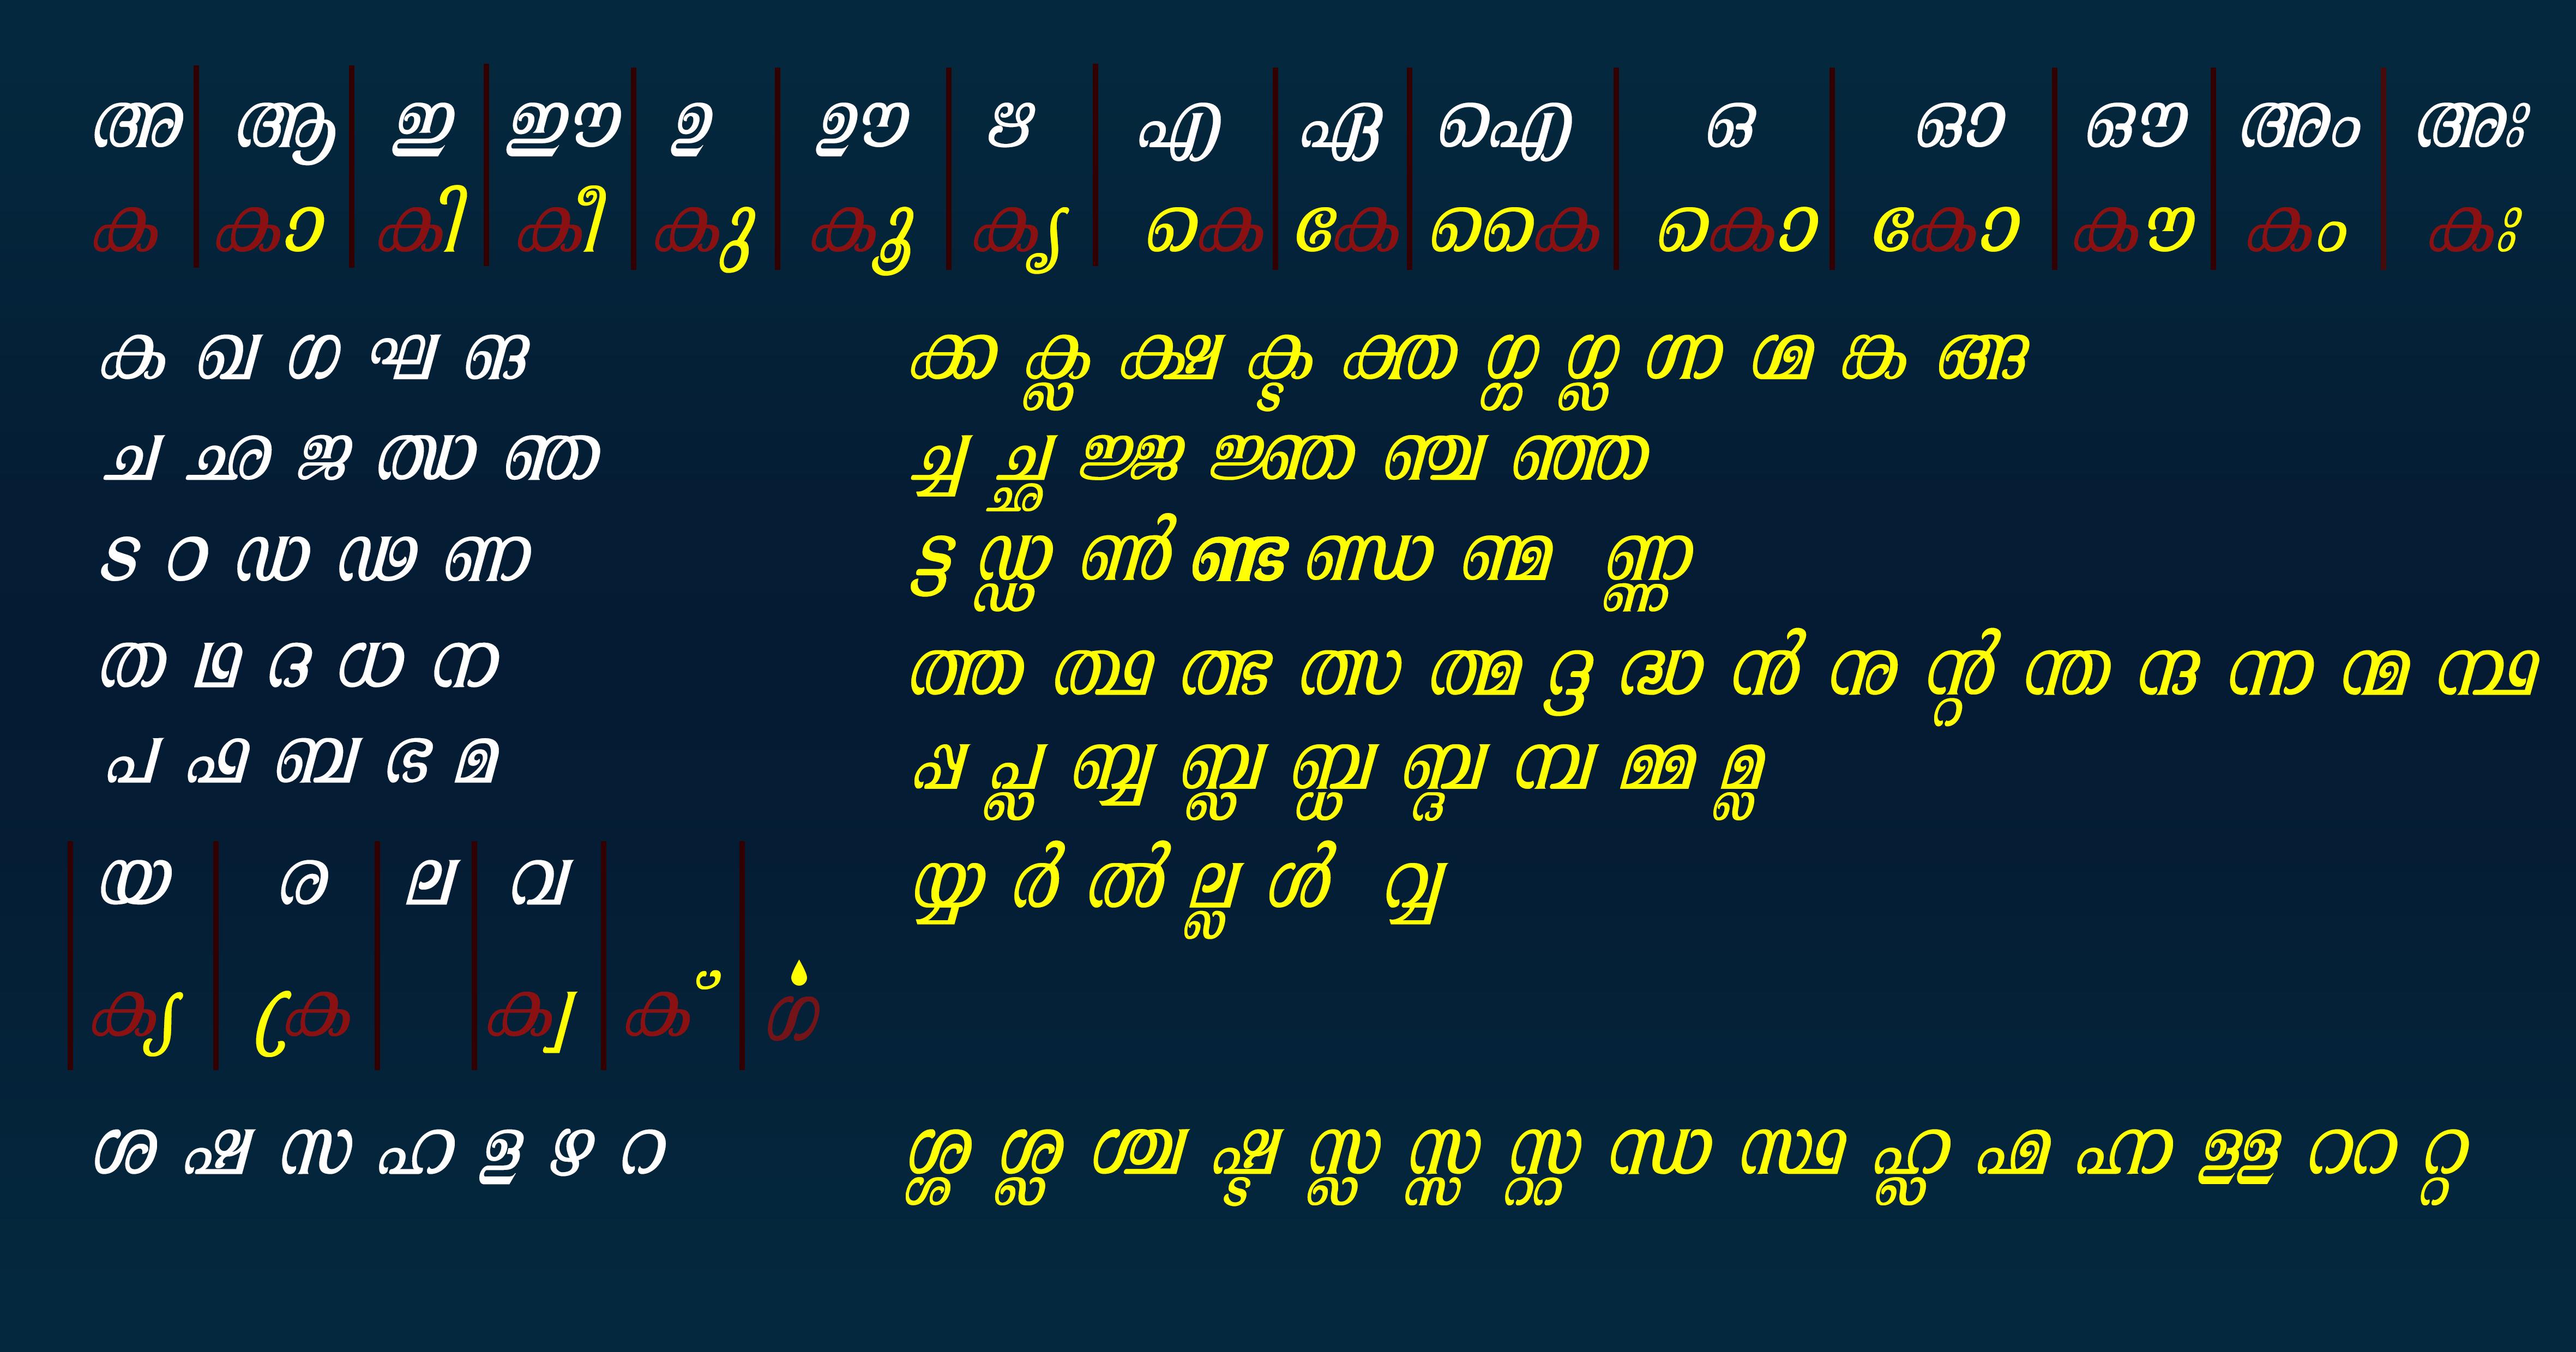 Vedi Kathakal Malayalam Language Malayalam letters[edit]Vedi Kathakal Malayalam Language